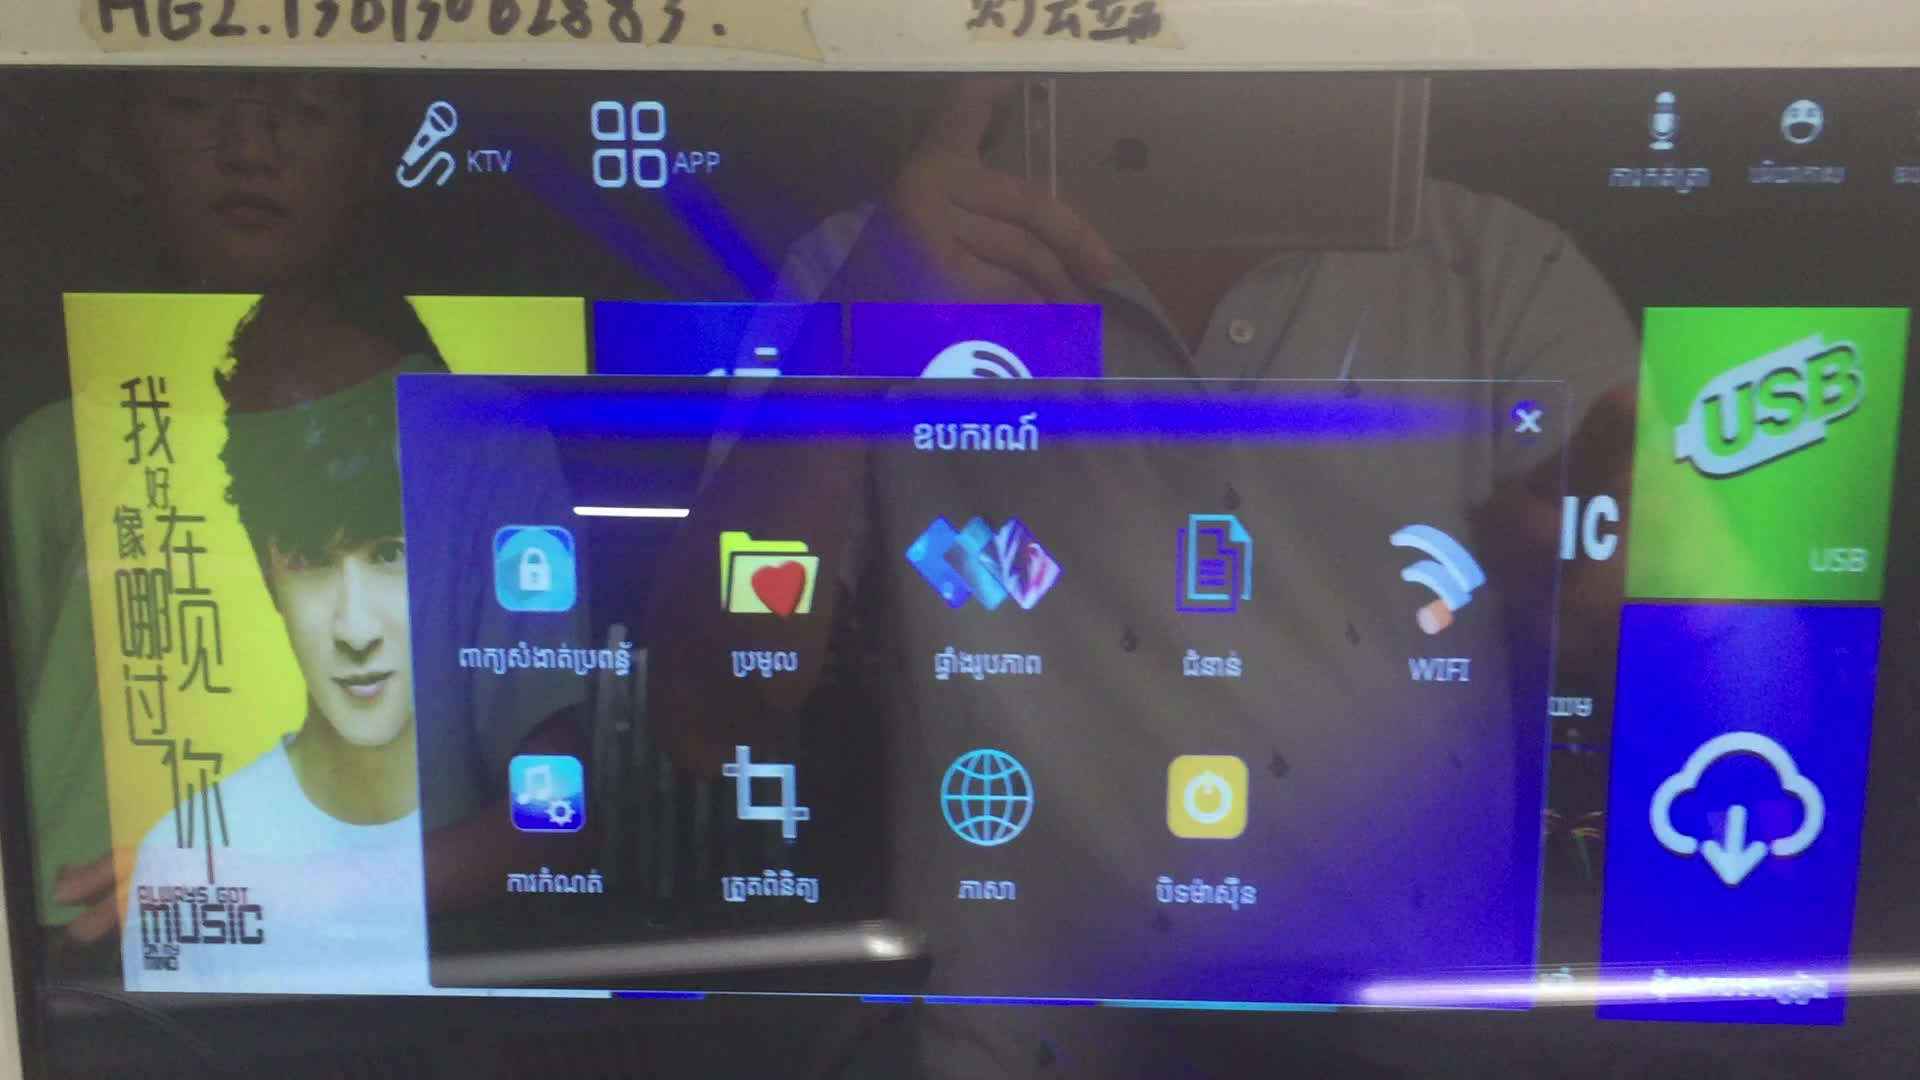 VOD Karaoke Sistem 22 Inch Layar Sentuh Android Karaoke Sistem untuk KTV House